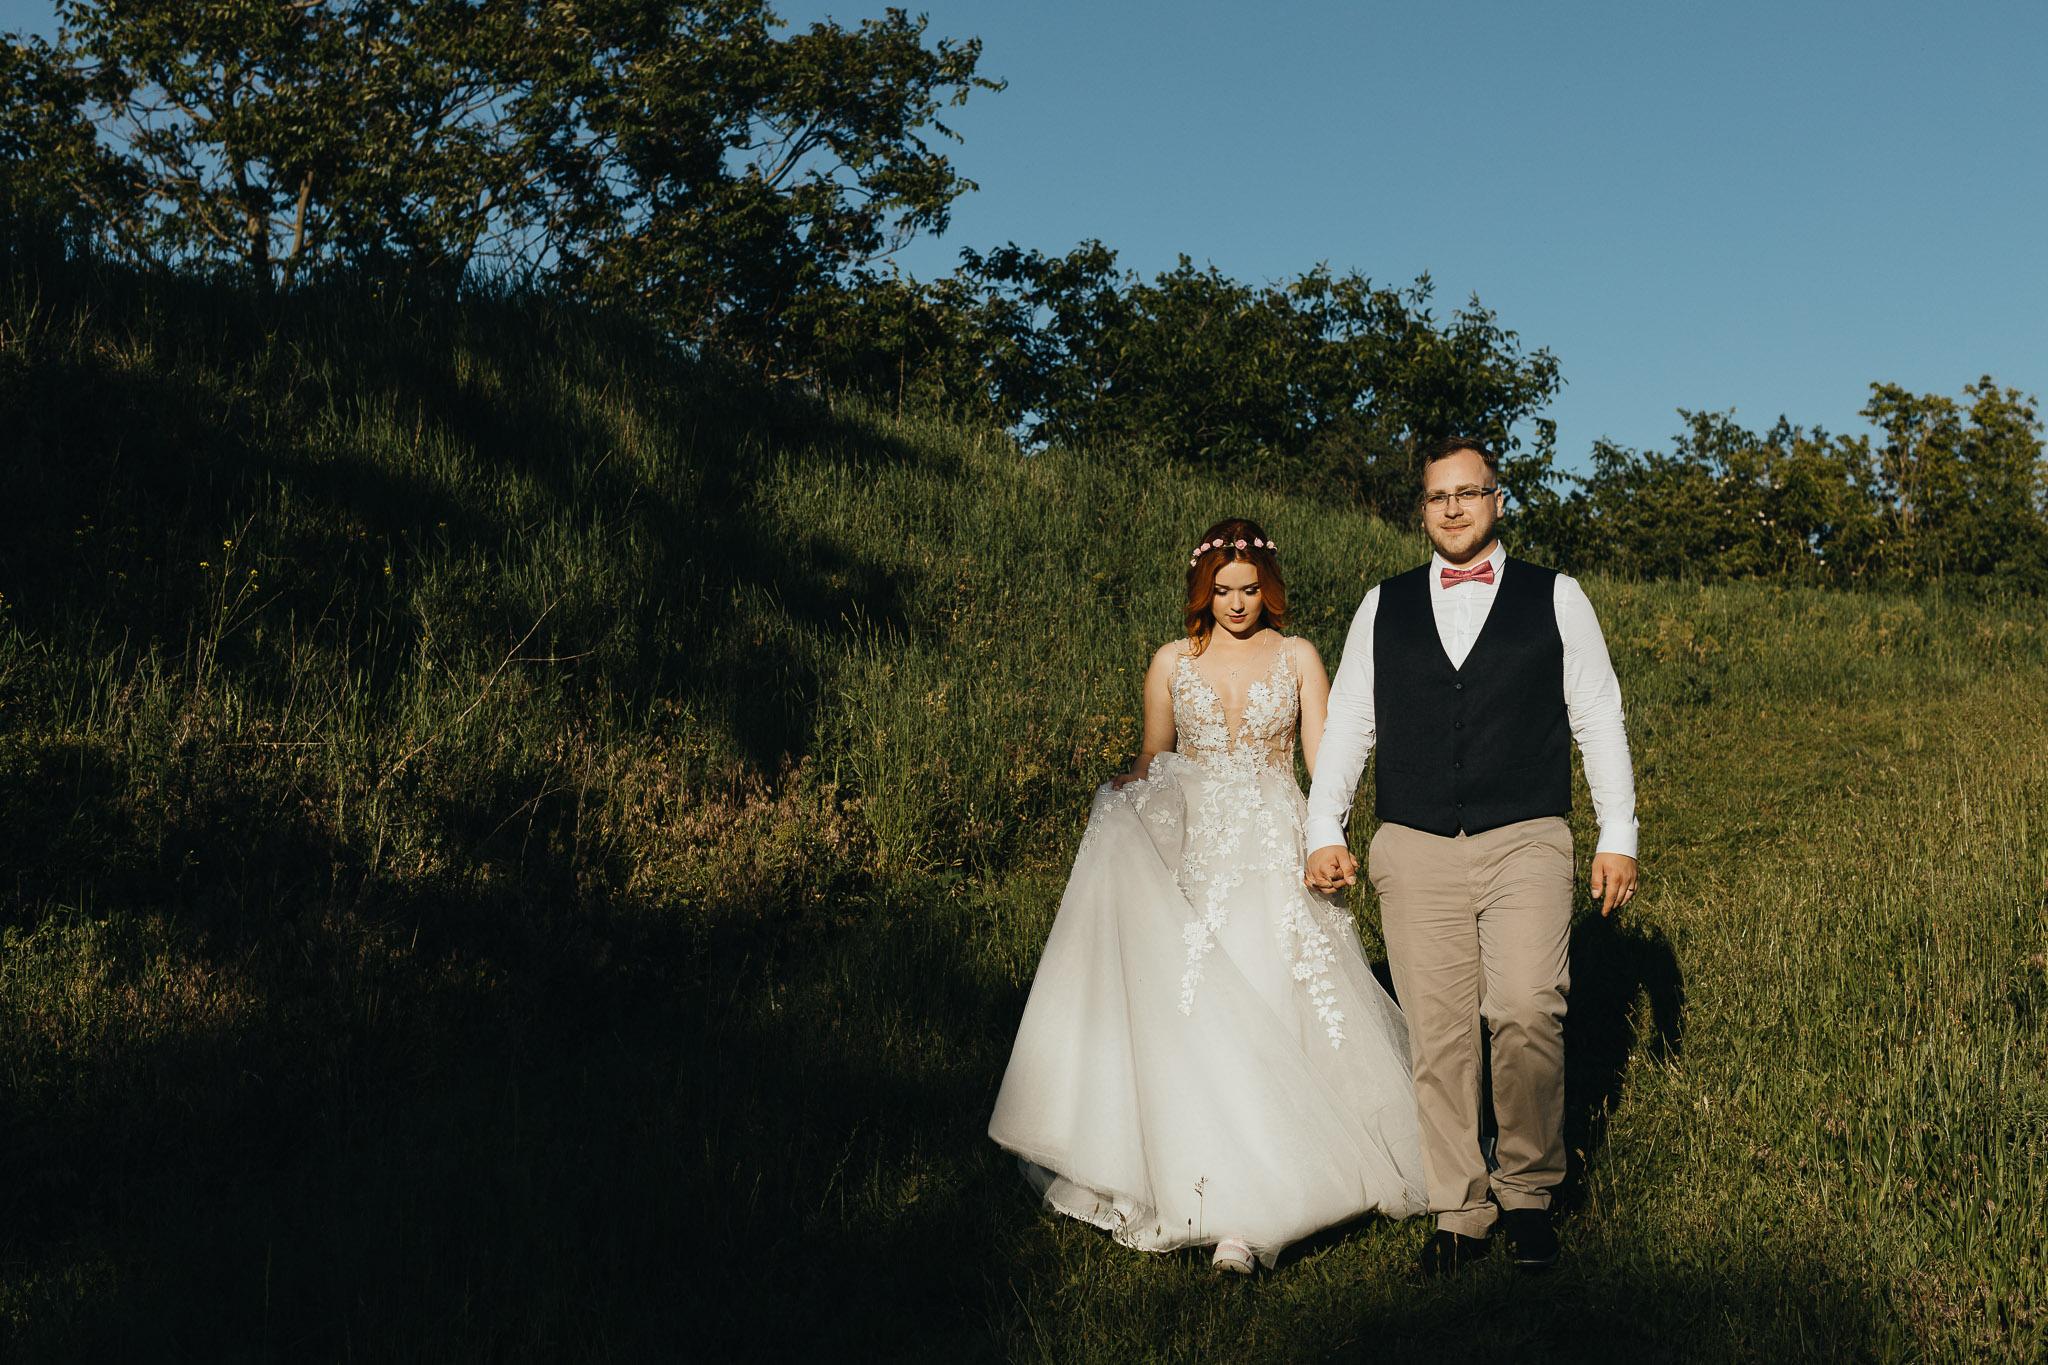 kubousfoto_svatebni_fotograf_brno_wedding_TL_35